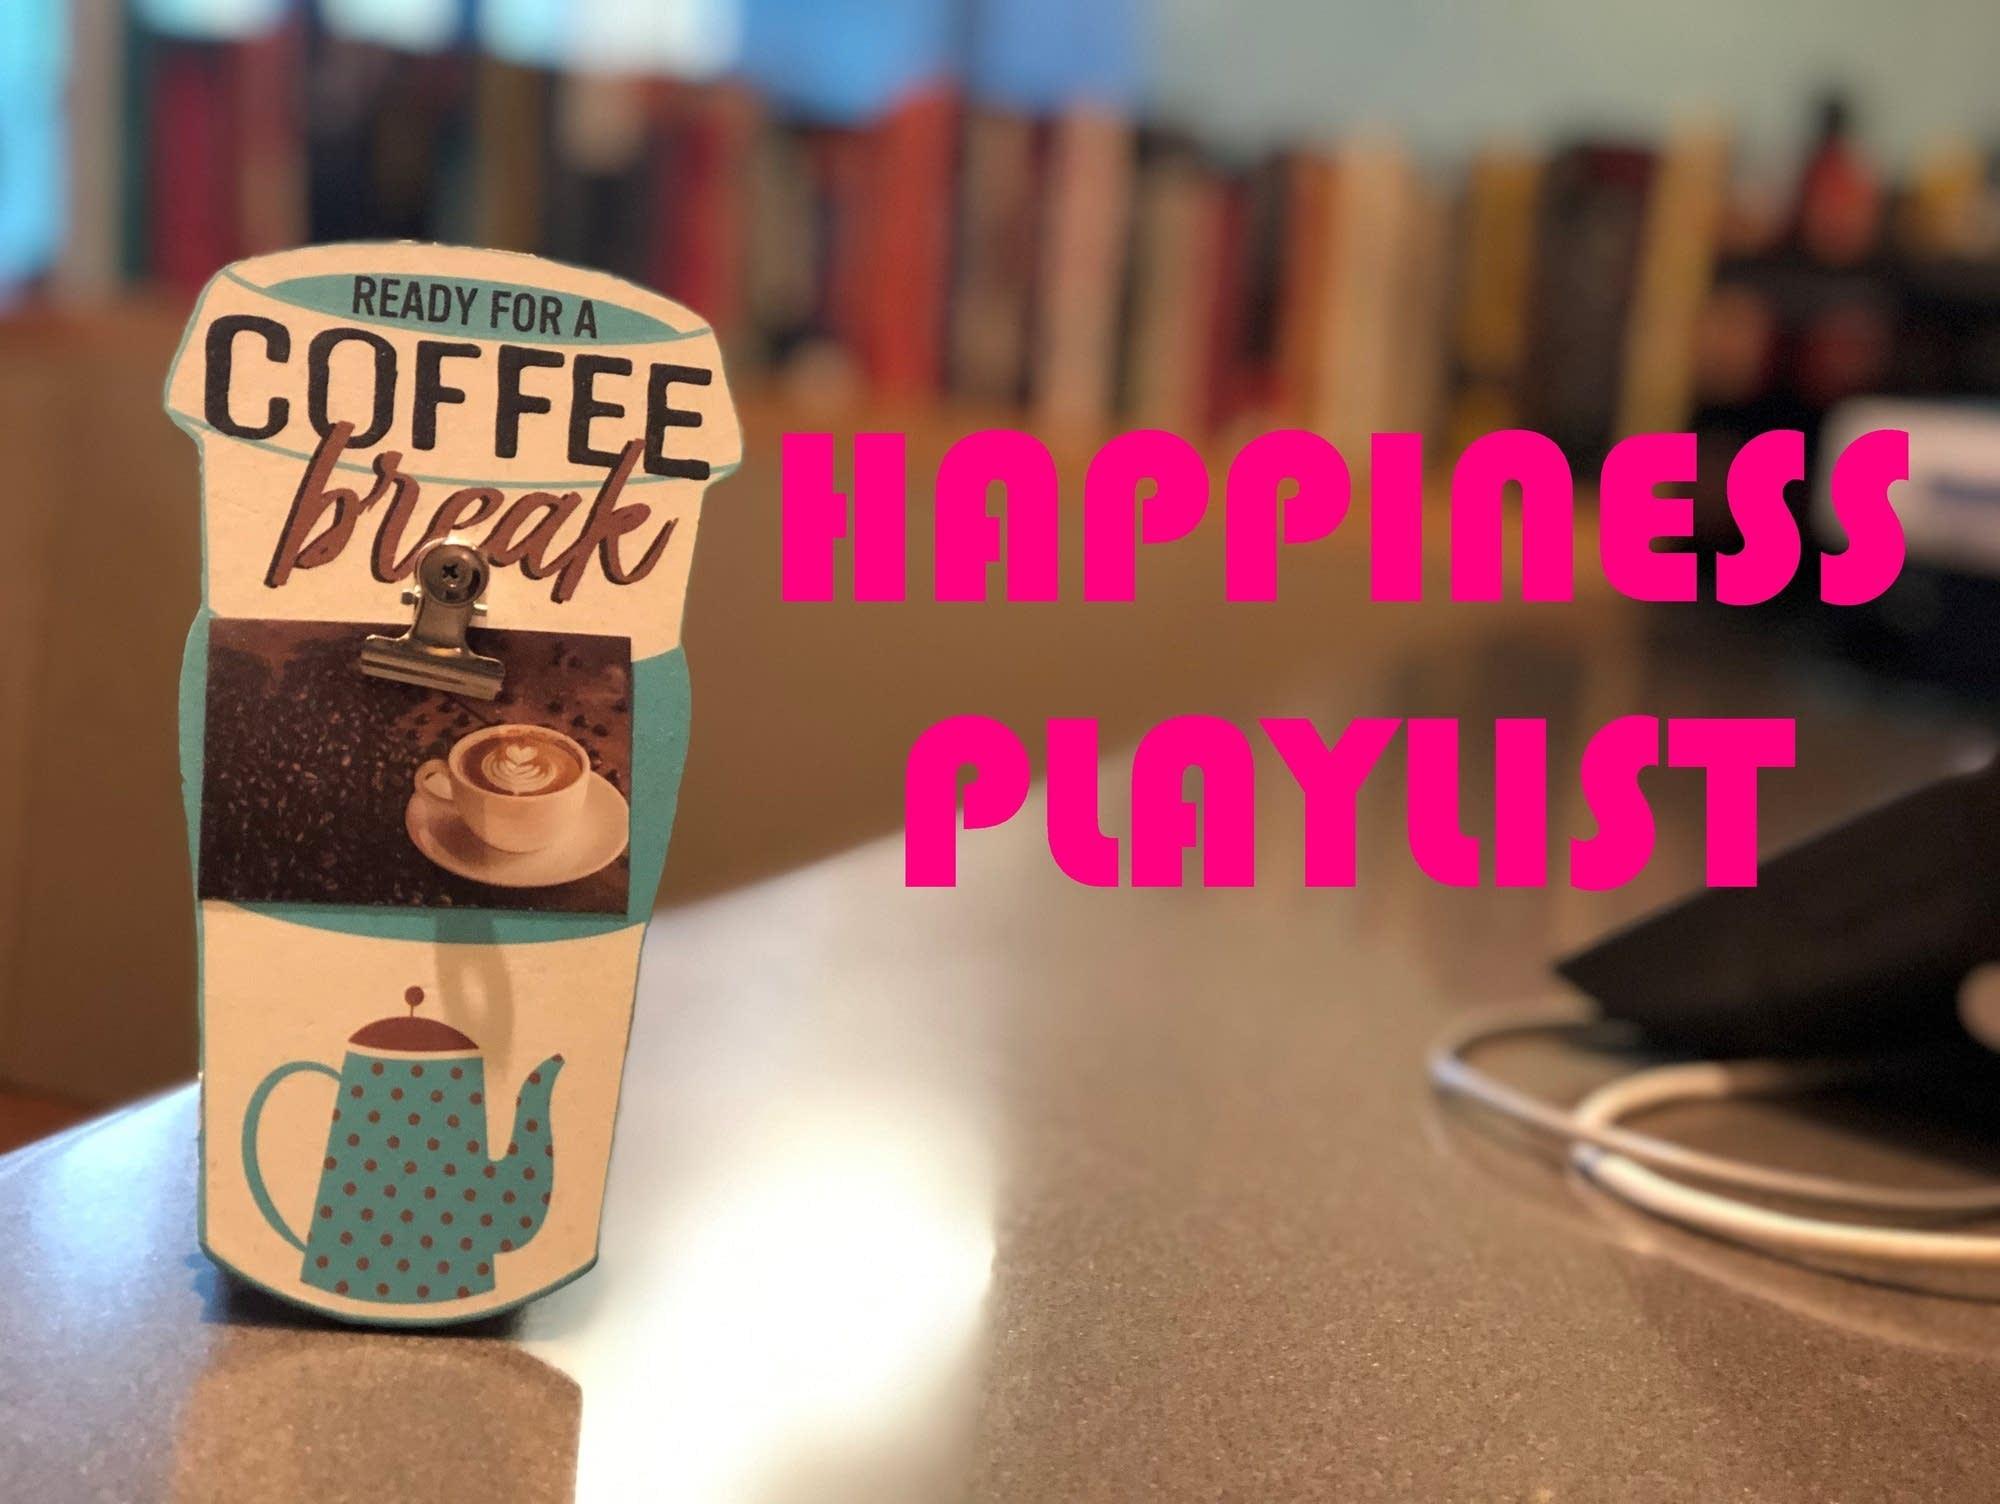 Coffee Break happiness playlist